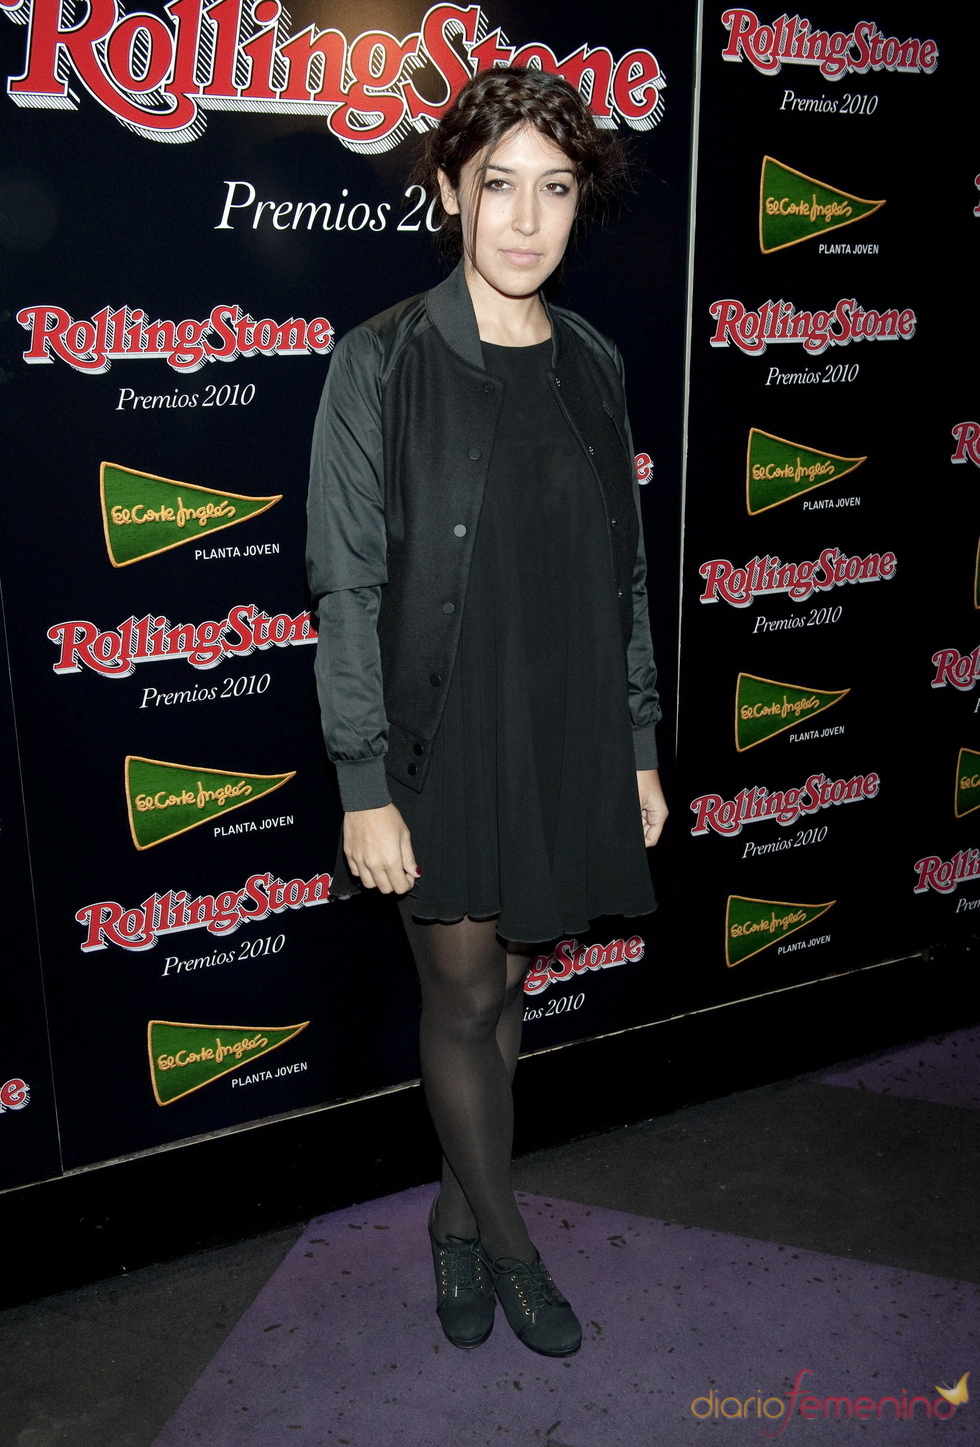 Anni B Sweet en los Premios Rolling Stone 2010